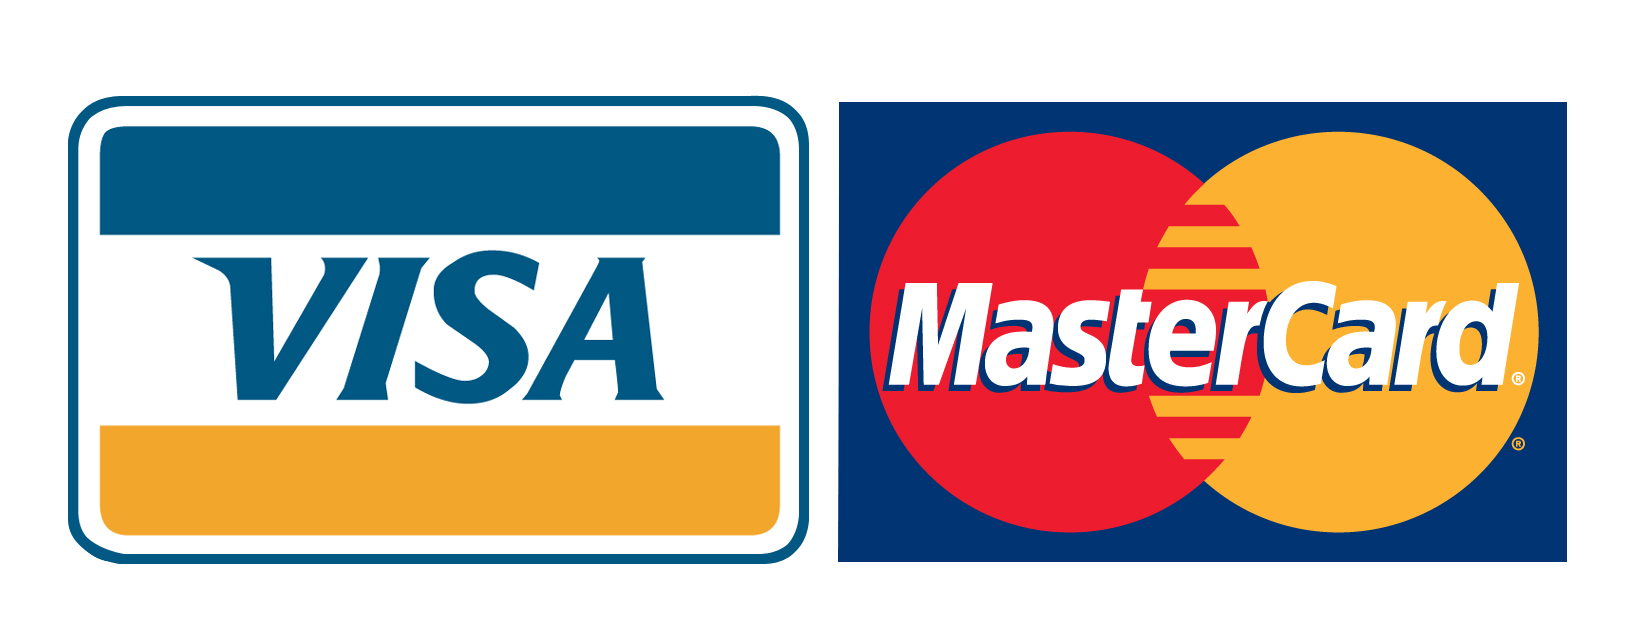 moyens de payements